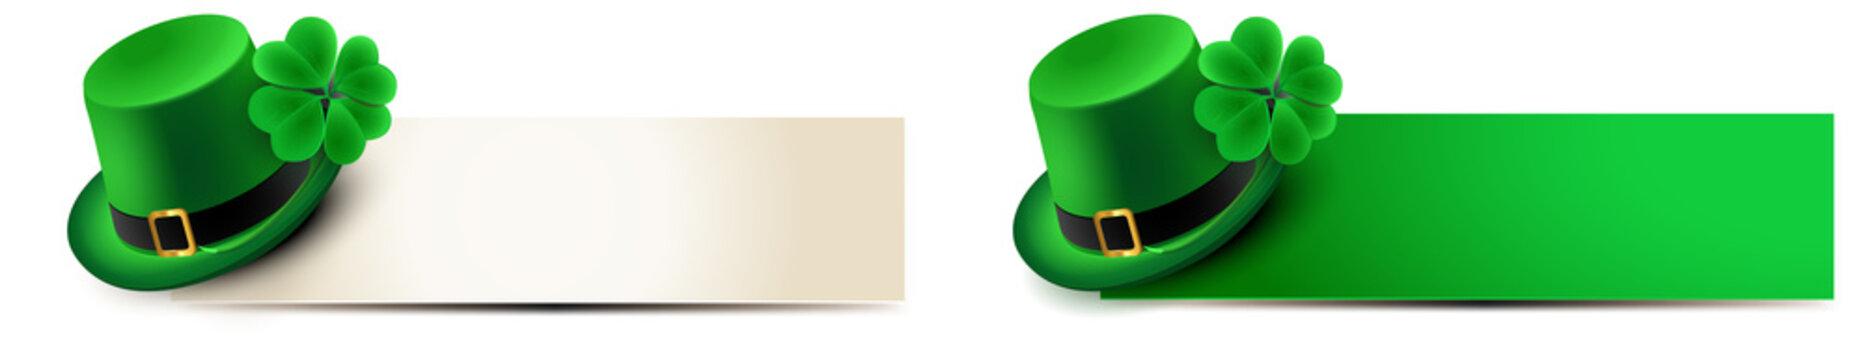 st patricks day - banner set with leprechaun hat and shamrock